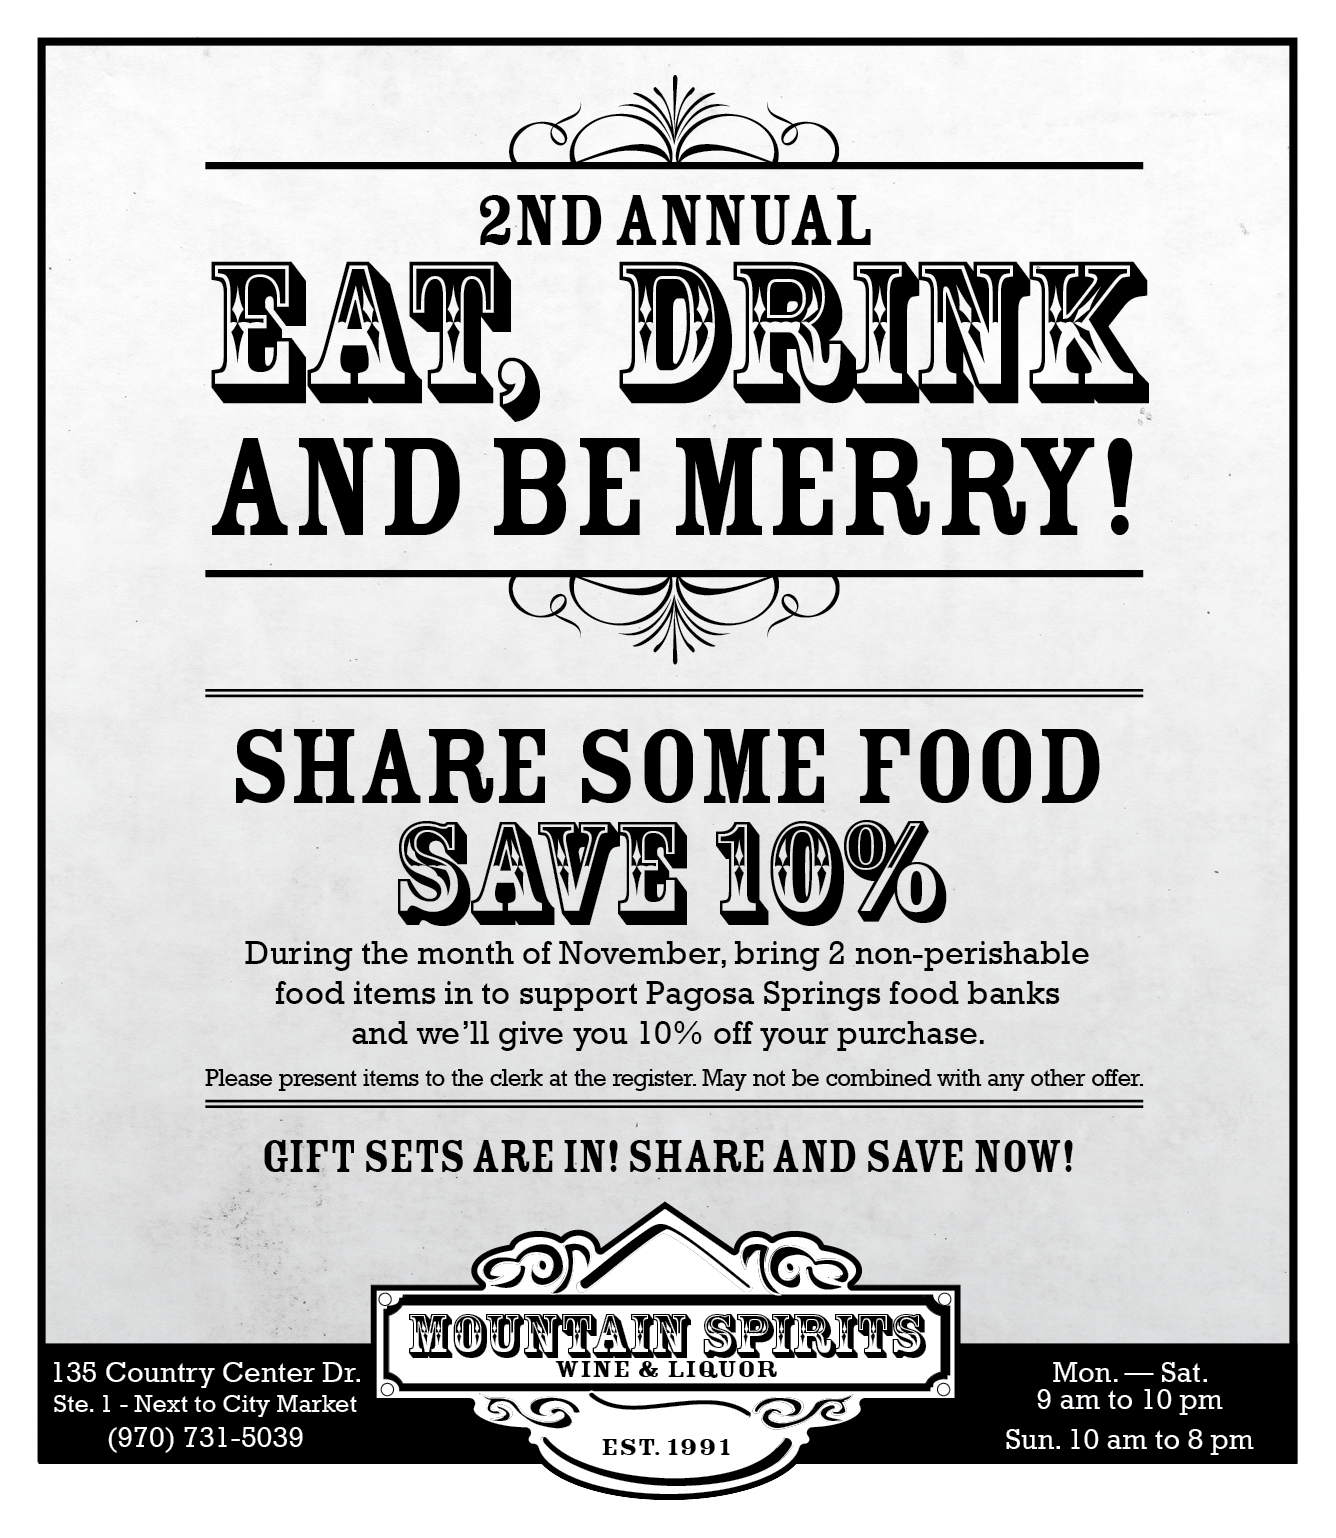 mtn spirits eat drink merry 2.jpg